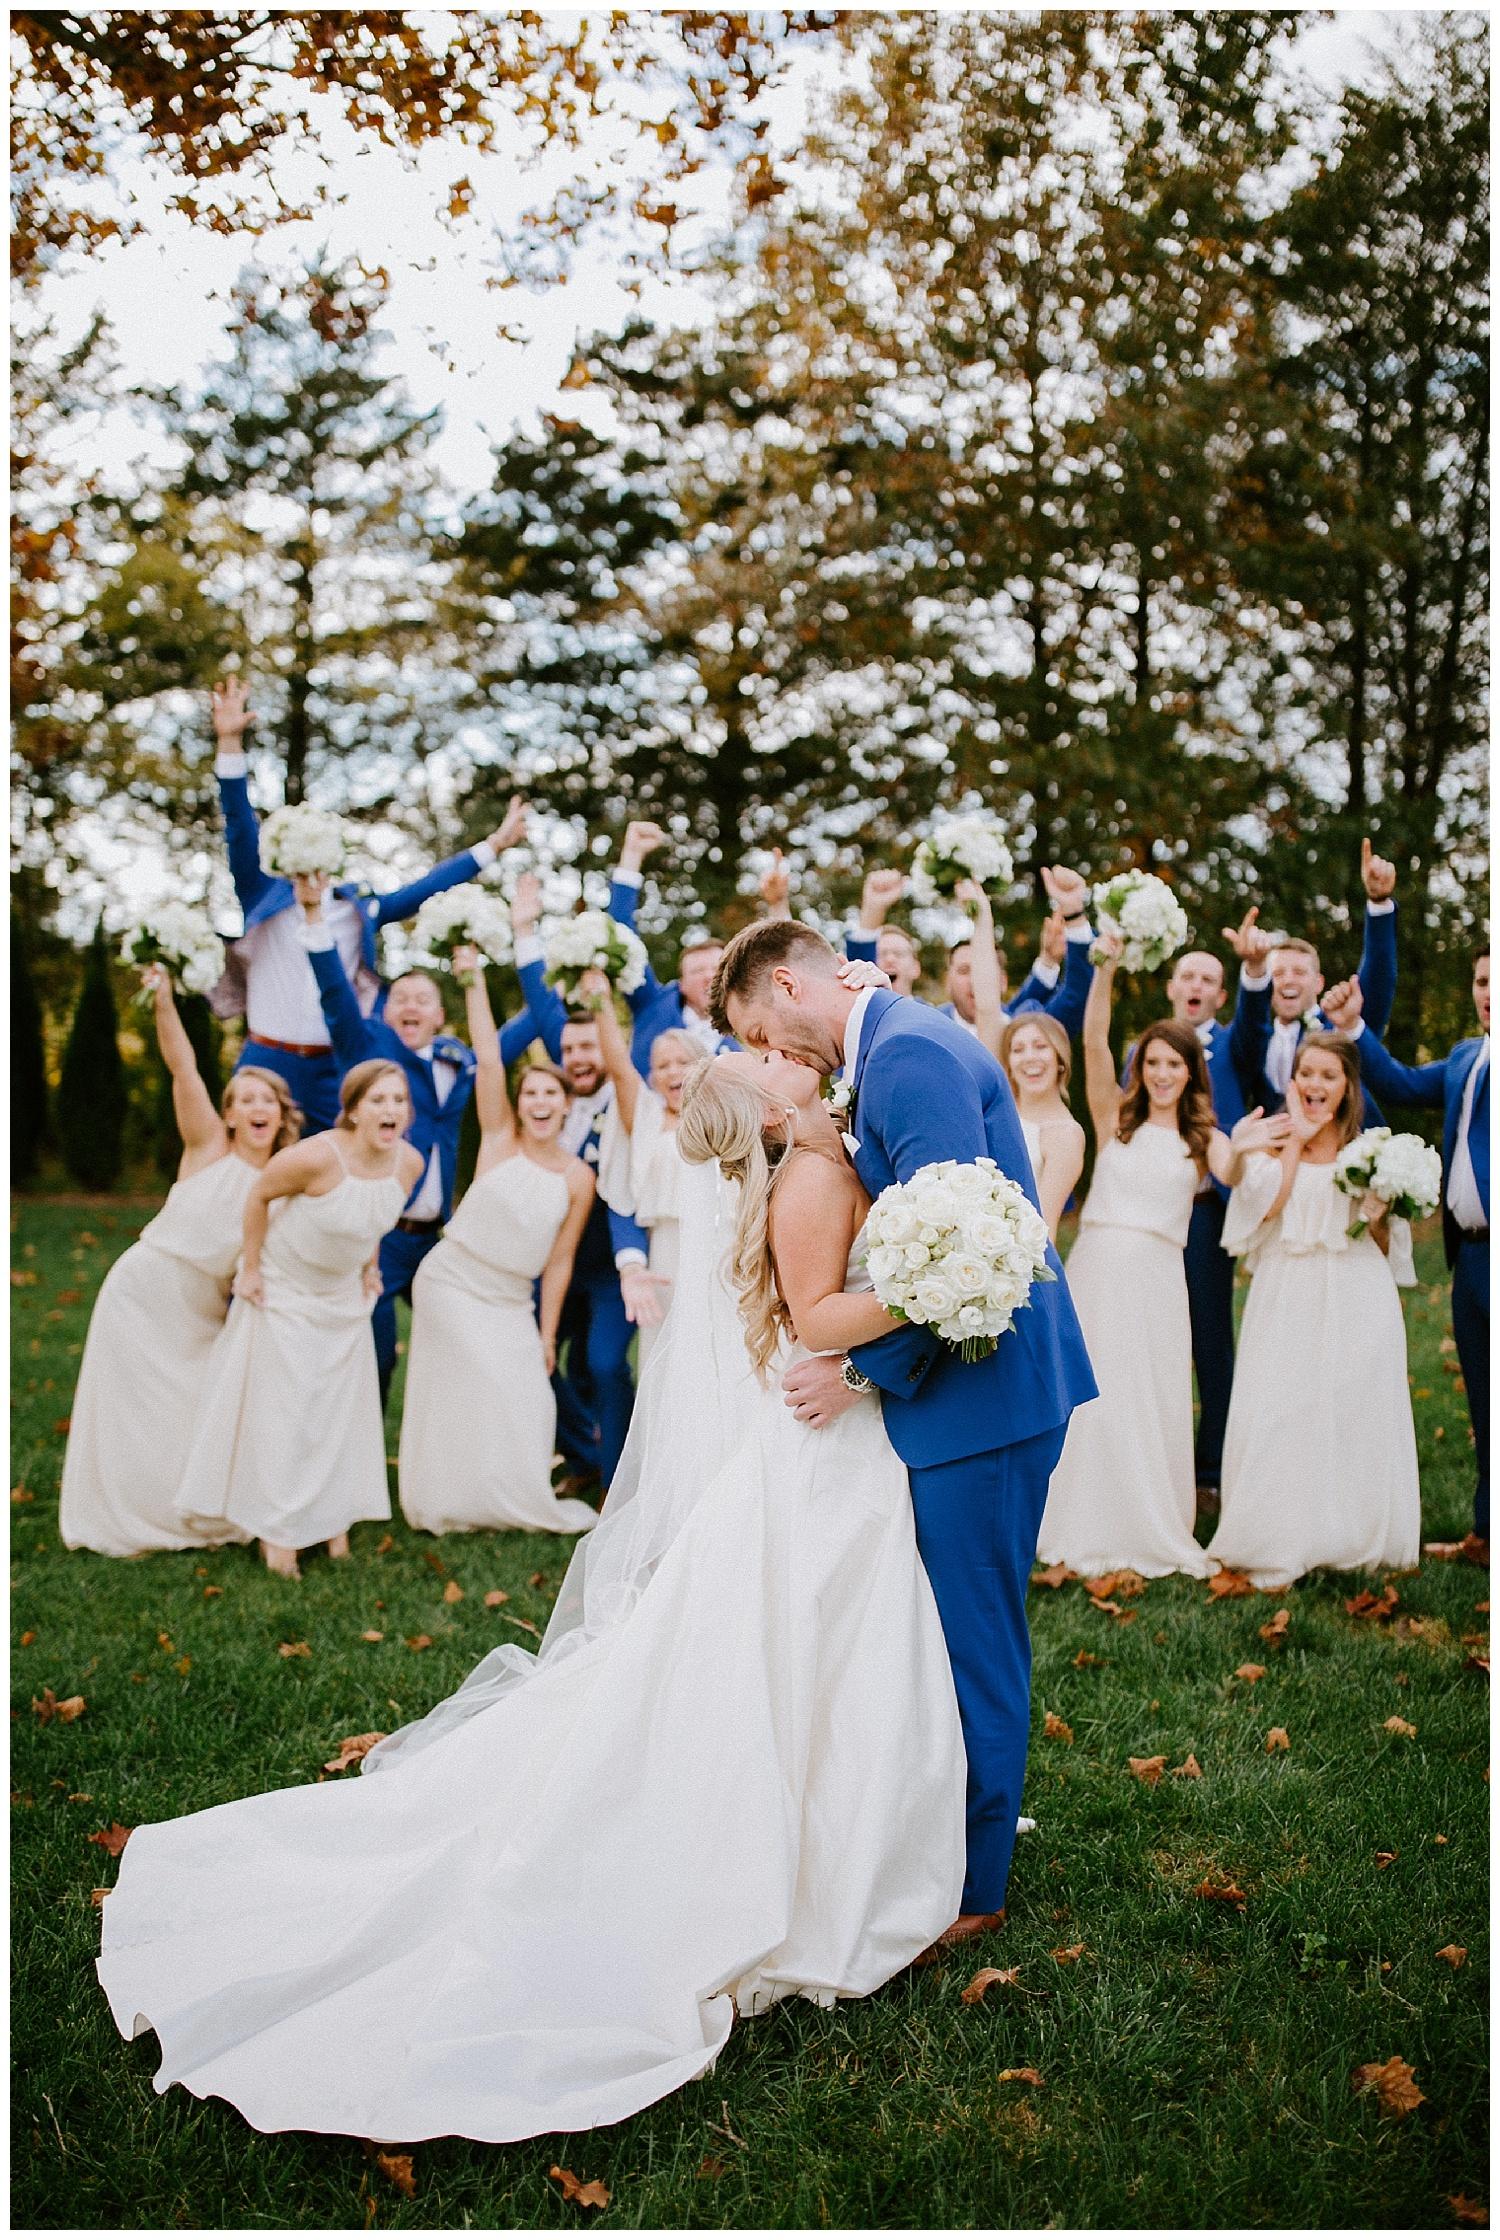 classy-wedding-sycamore_farms-nashville-tn2019-01-22_0049.jpg